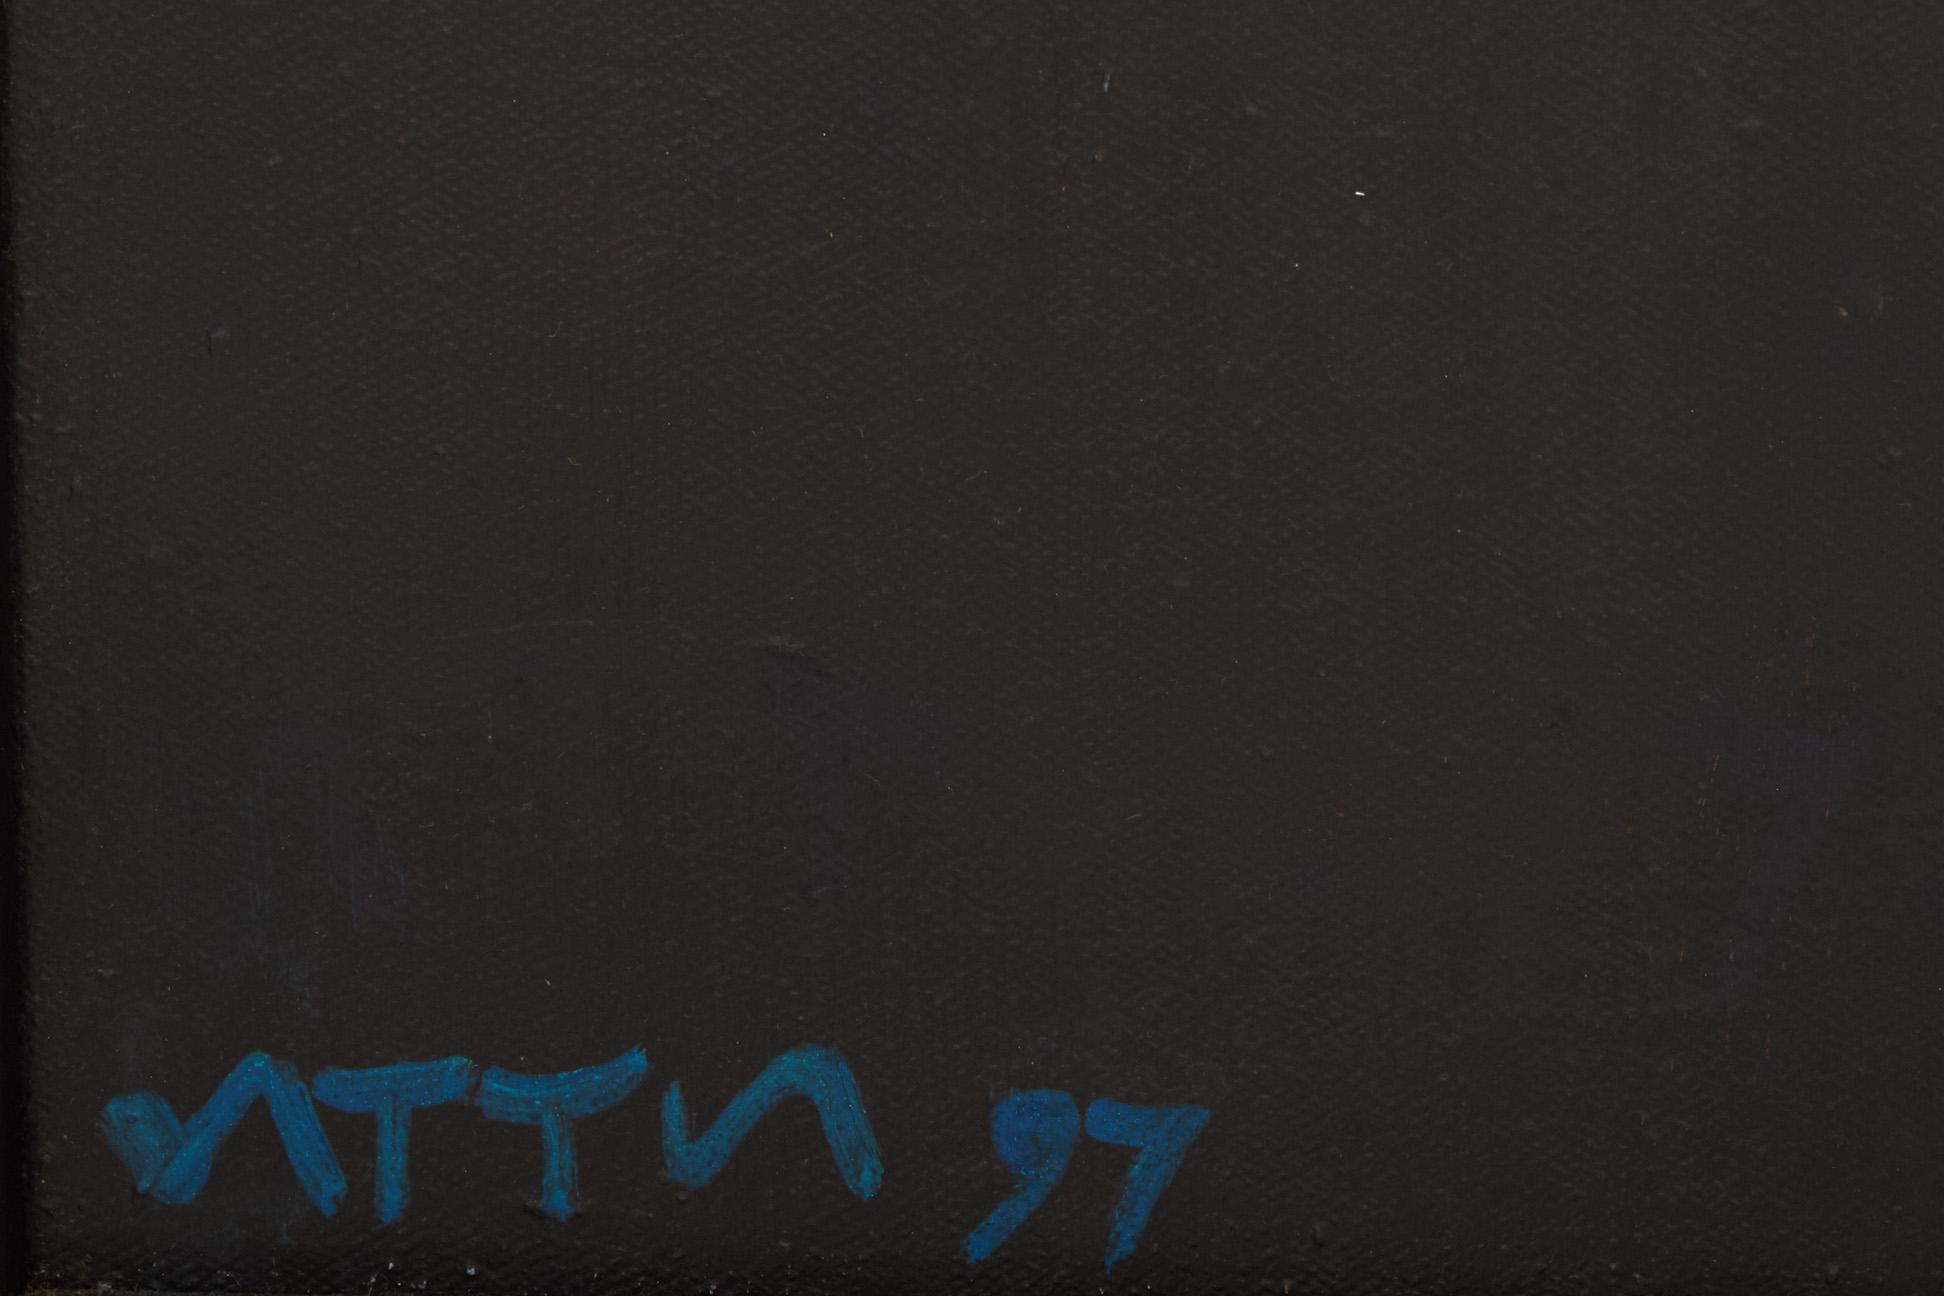 NGUYEN THAI TUAN (VIETNAMESE, B. 1965) - THE NEGOTIATOR - Image 4 of 5